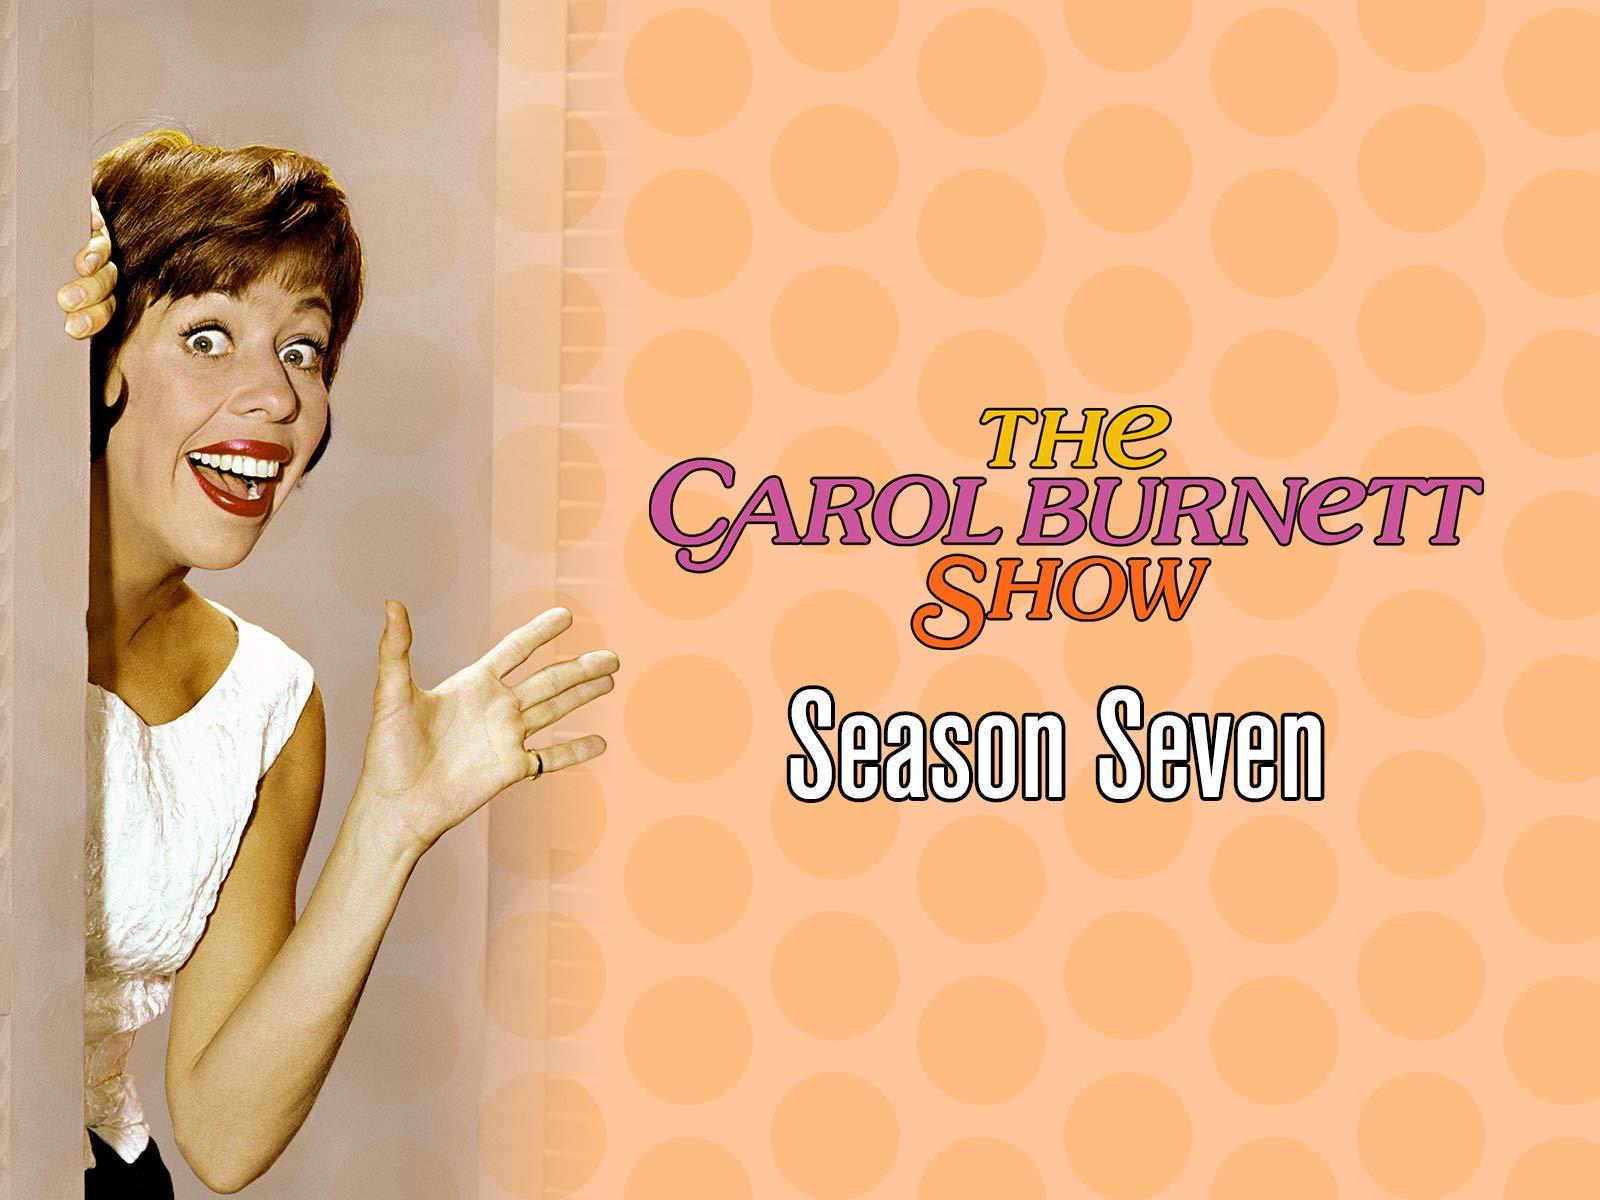 The Carol Burnett Show - Season 7